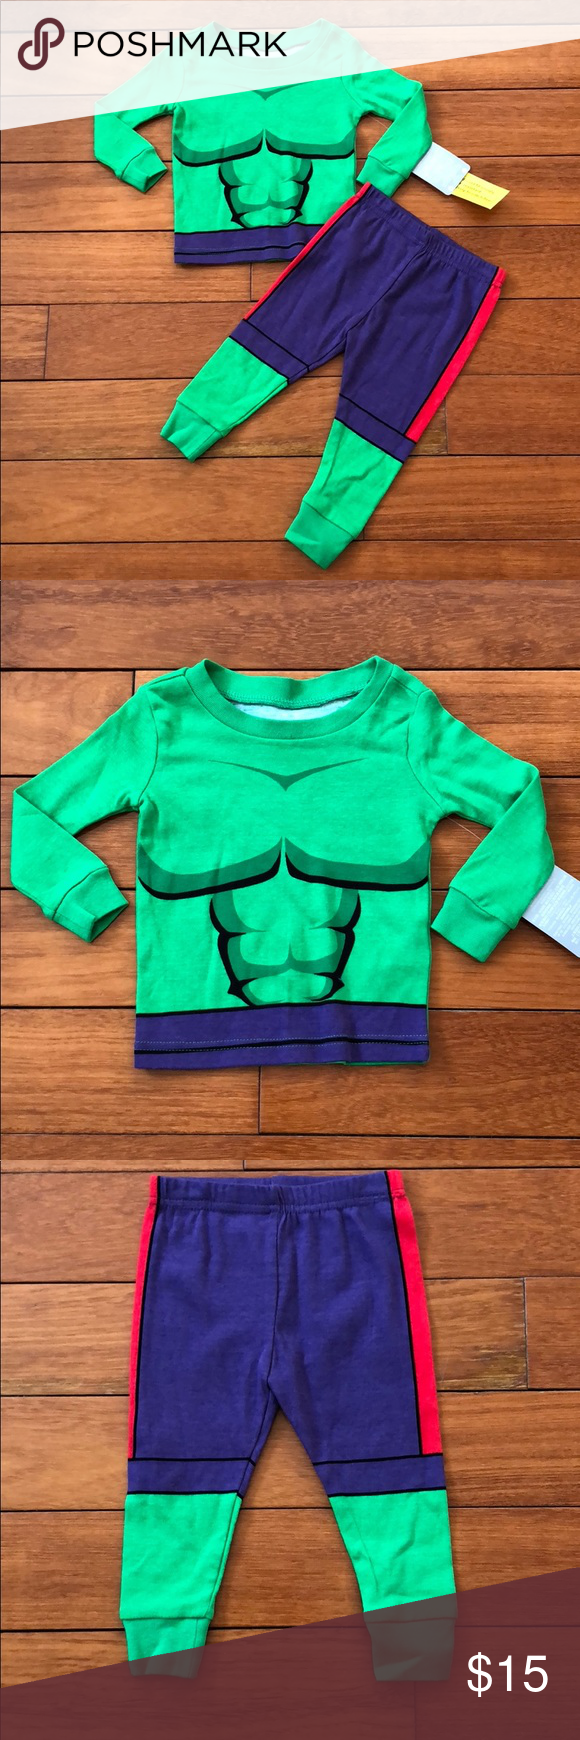 NWT Baby Gap Dinosaur Short Sleeve Shorts Pajamas PJs 2PC Toddler Boy